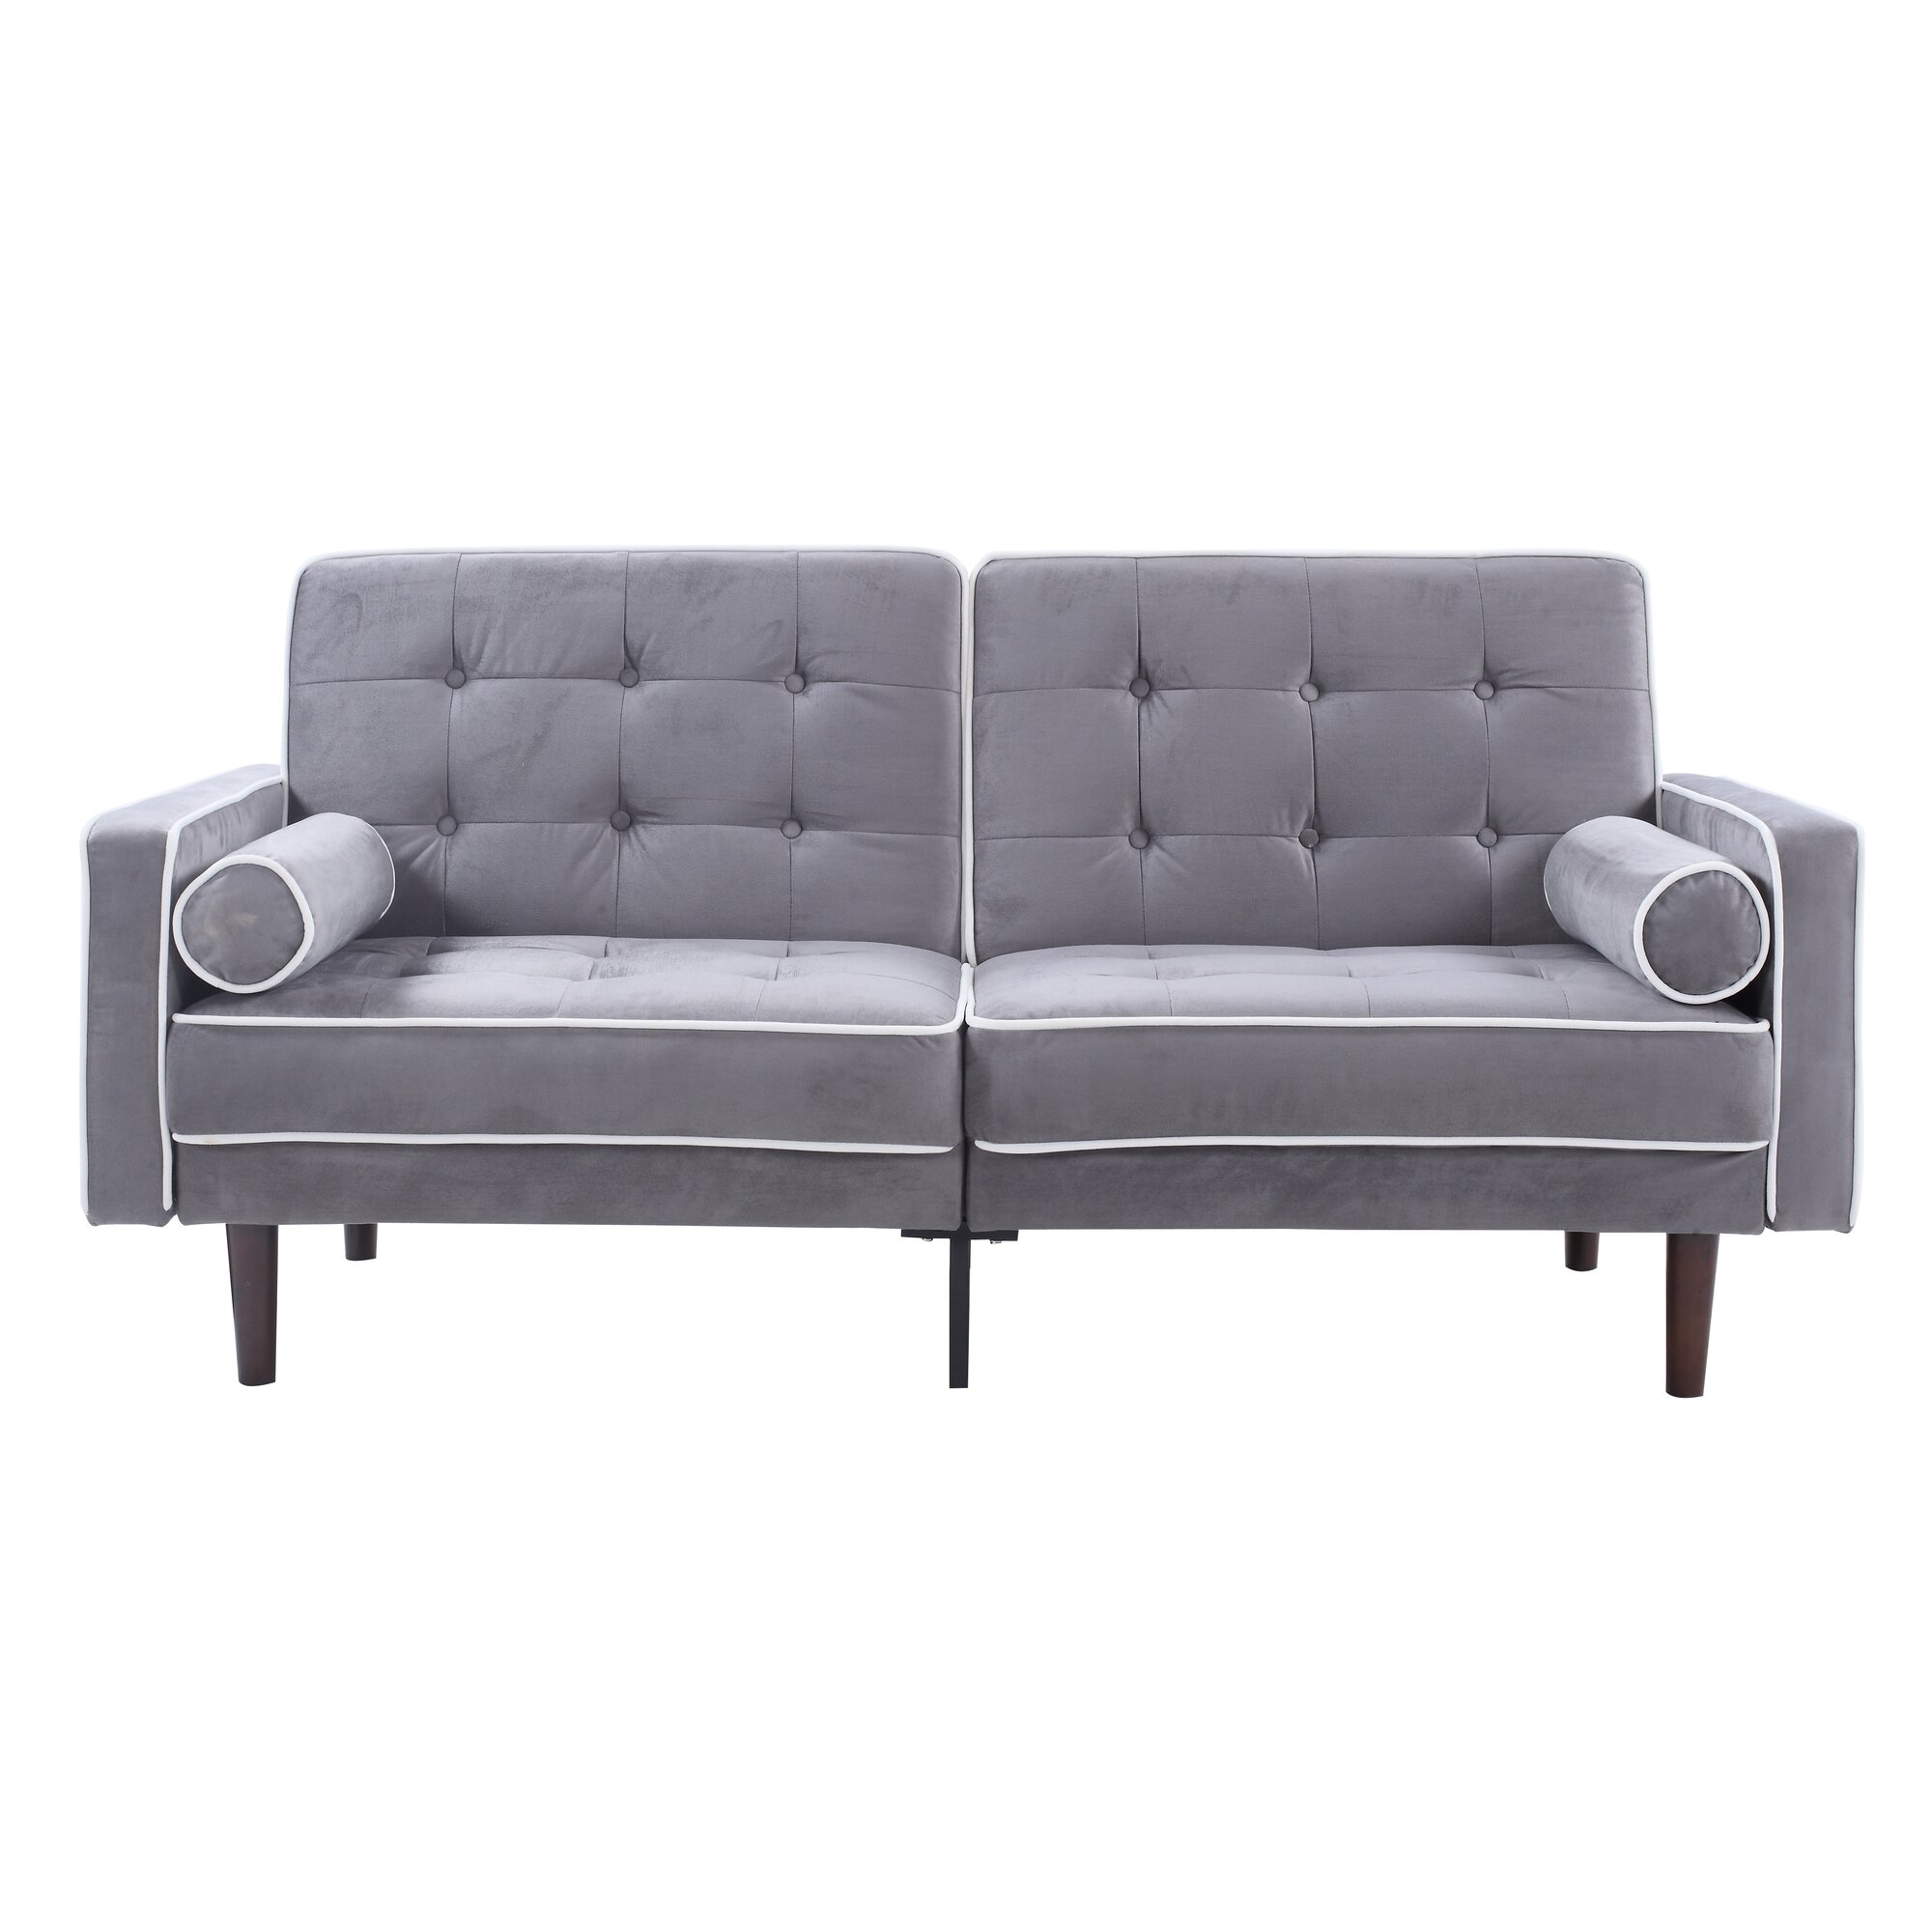 Mid Century Modern Convertible Sofa Reviews AllModern